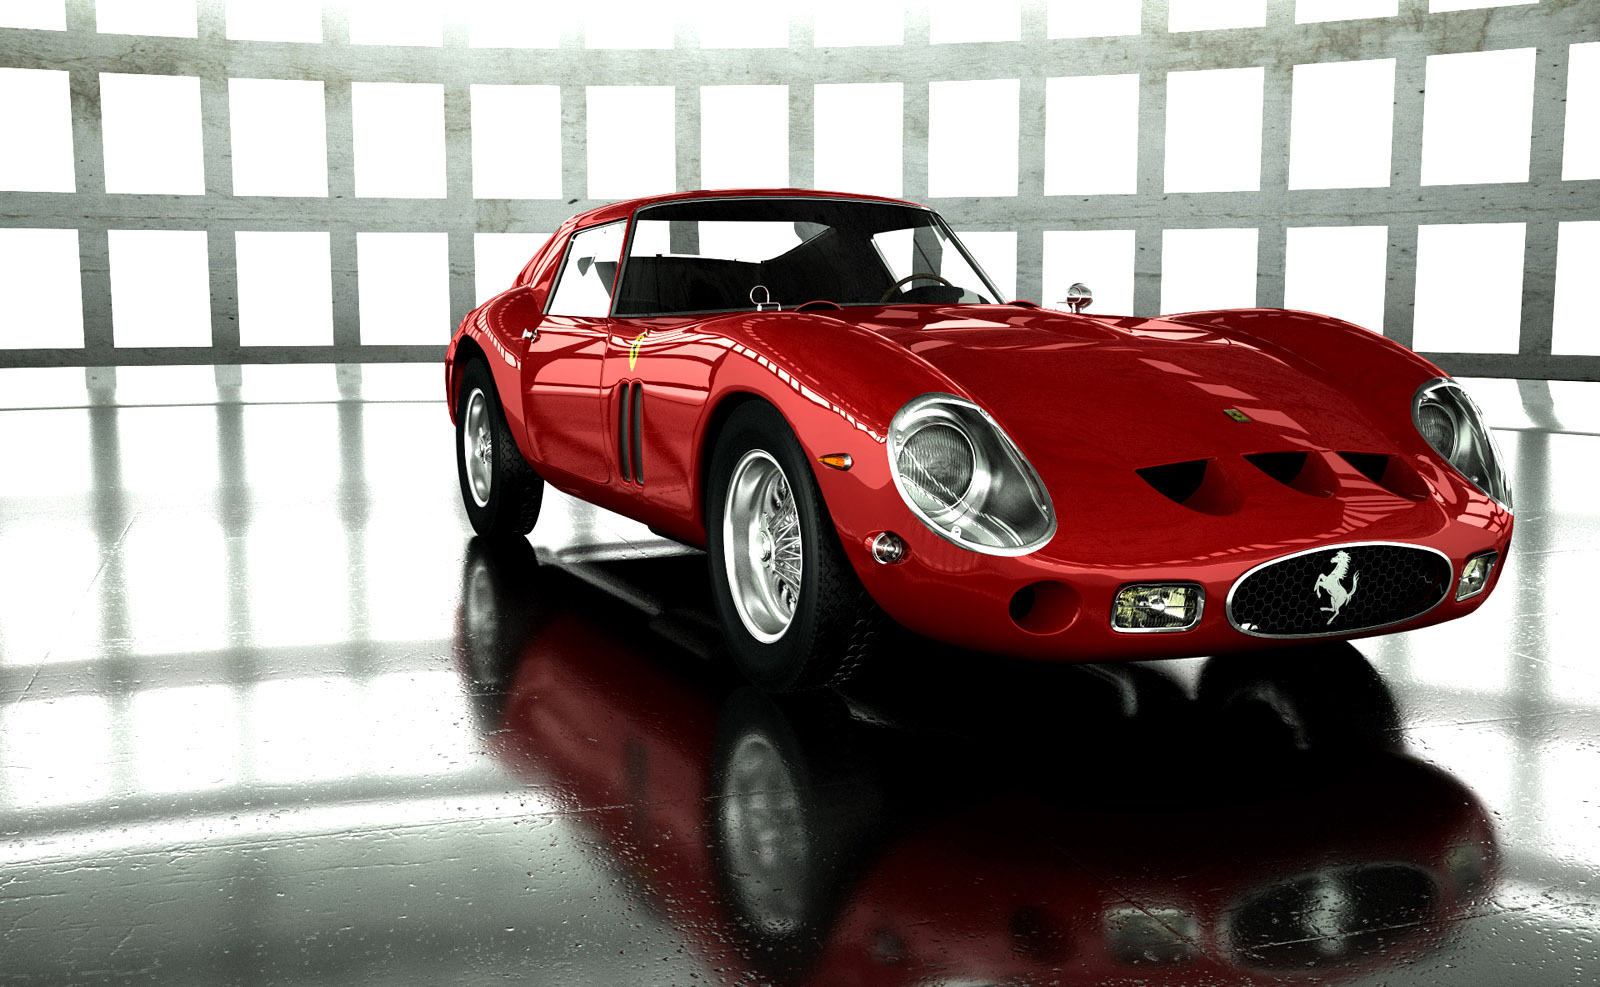 Ferrari 250 Gto Wallpapers: Ferrari 250 GTO Wallpaper 09